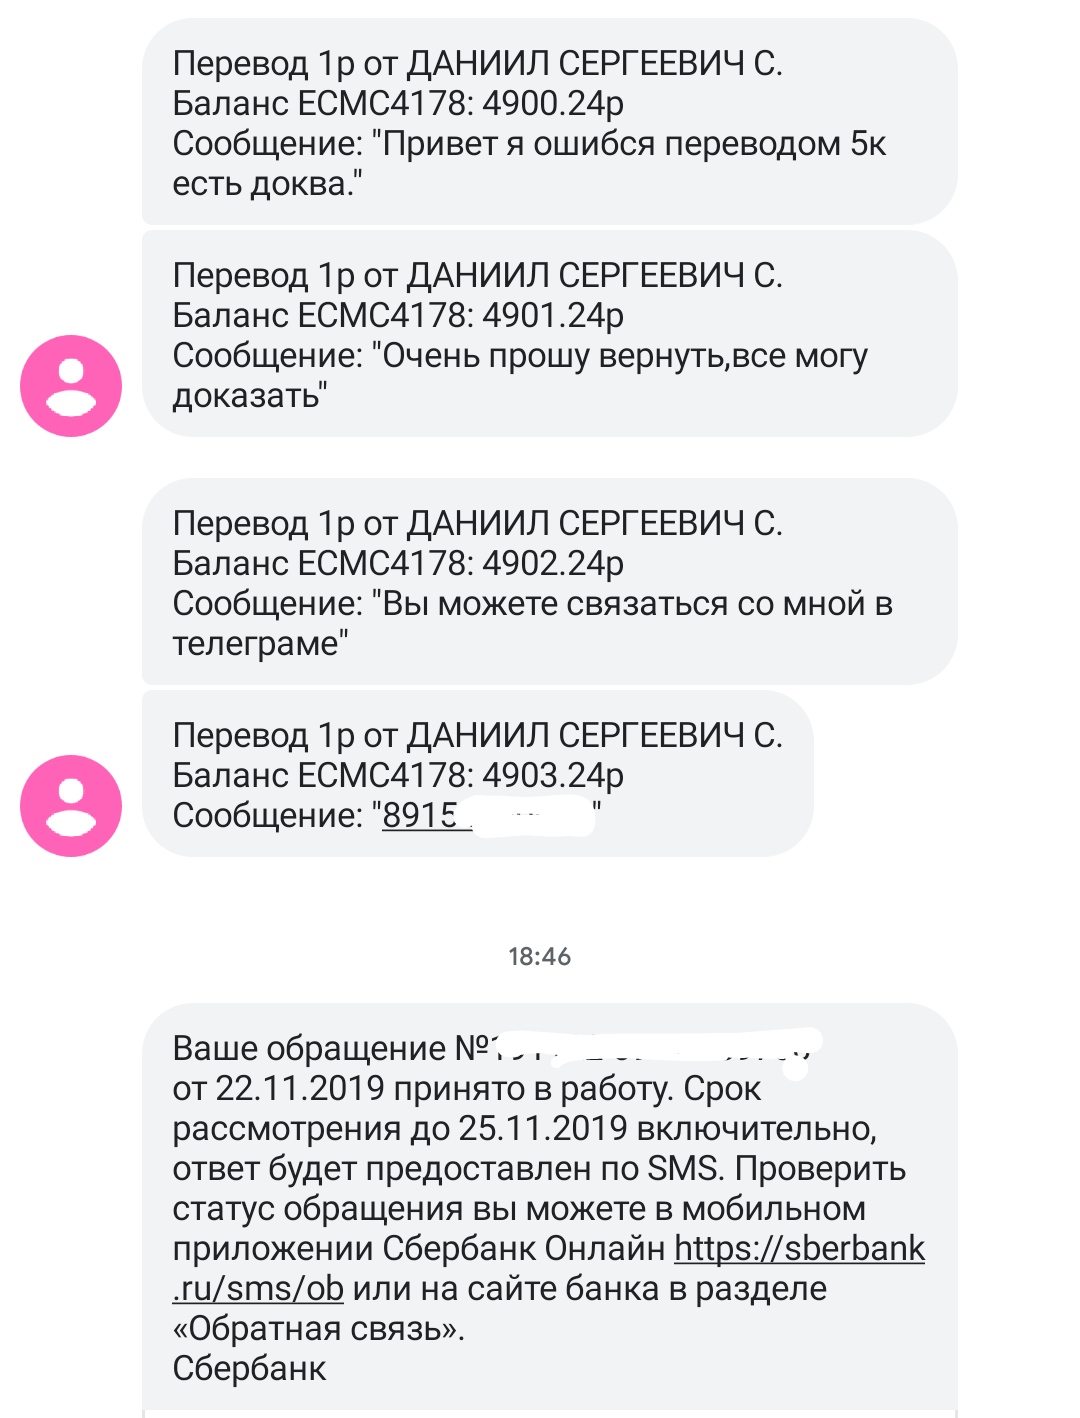 Связь банк онлайн перевод